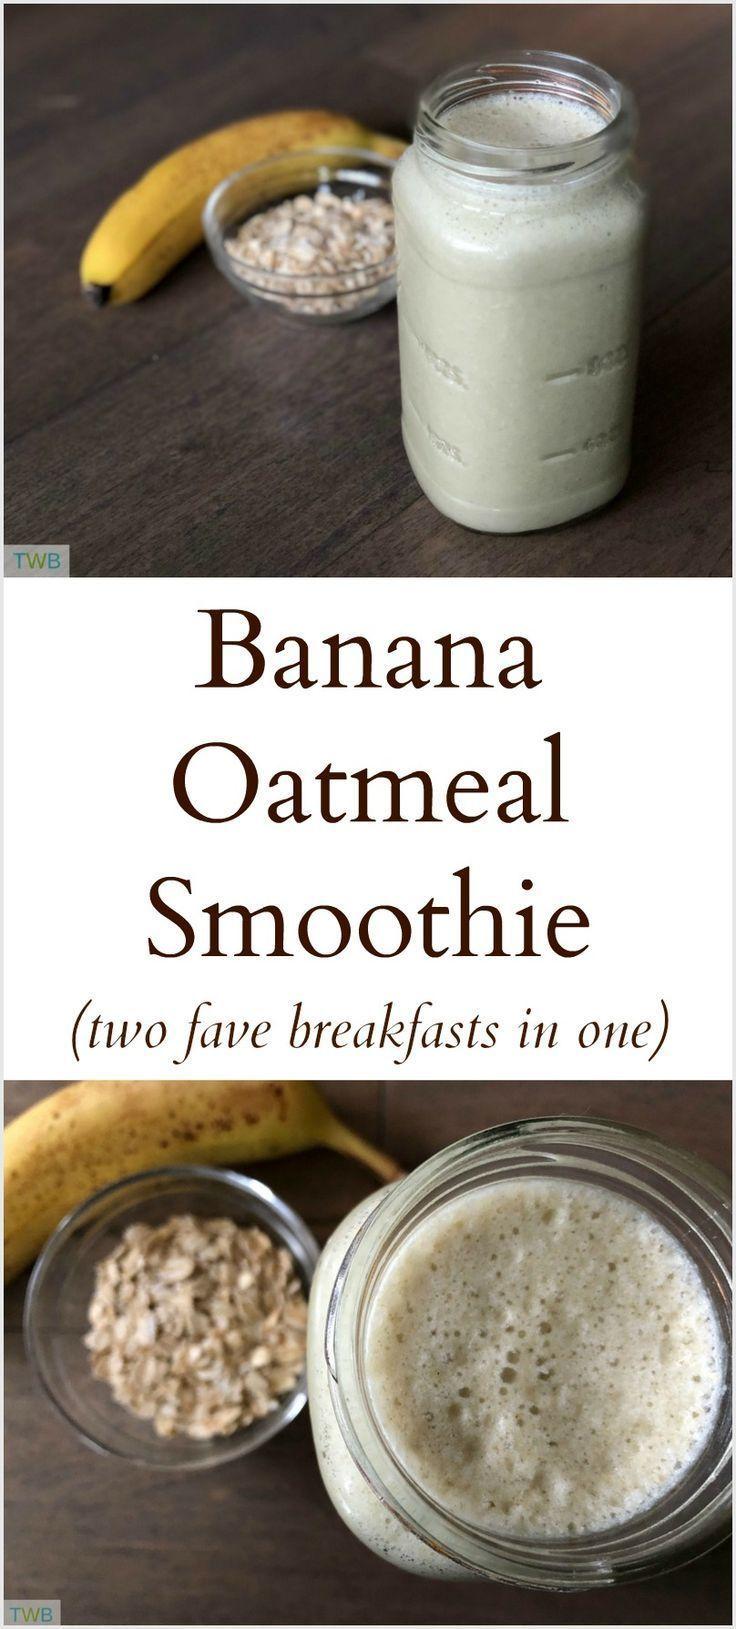 Banana Oatmeal Smoothie images